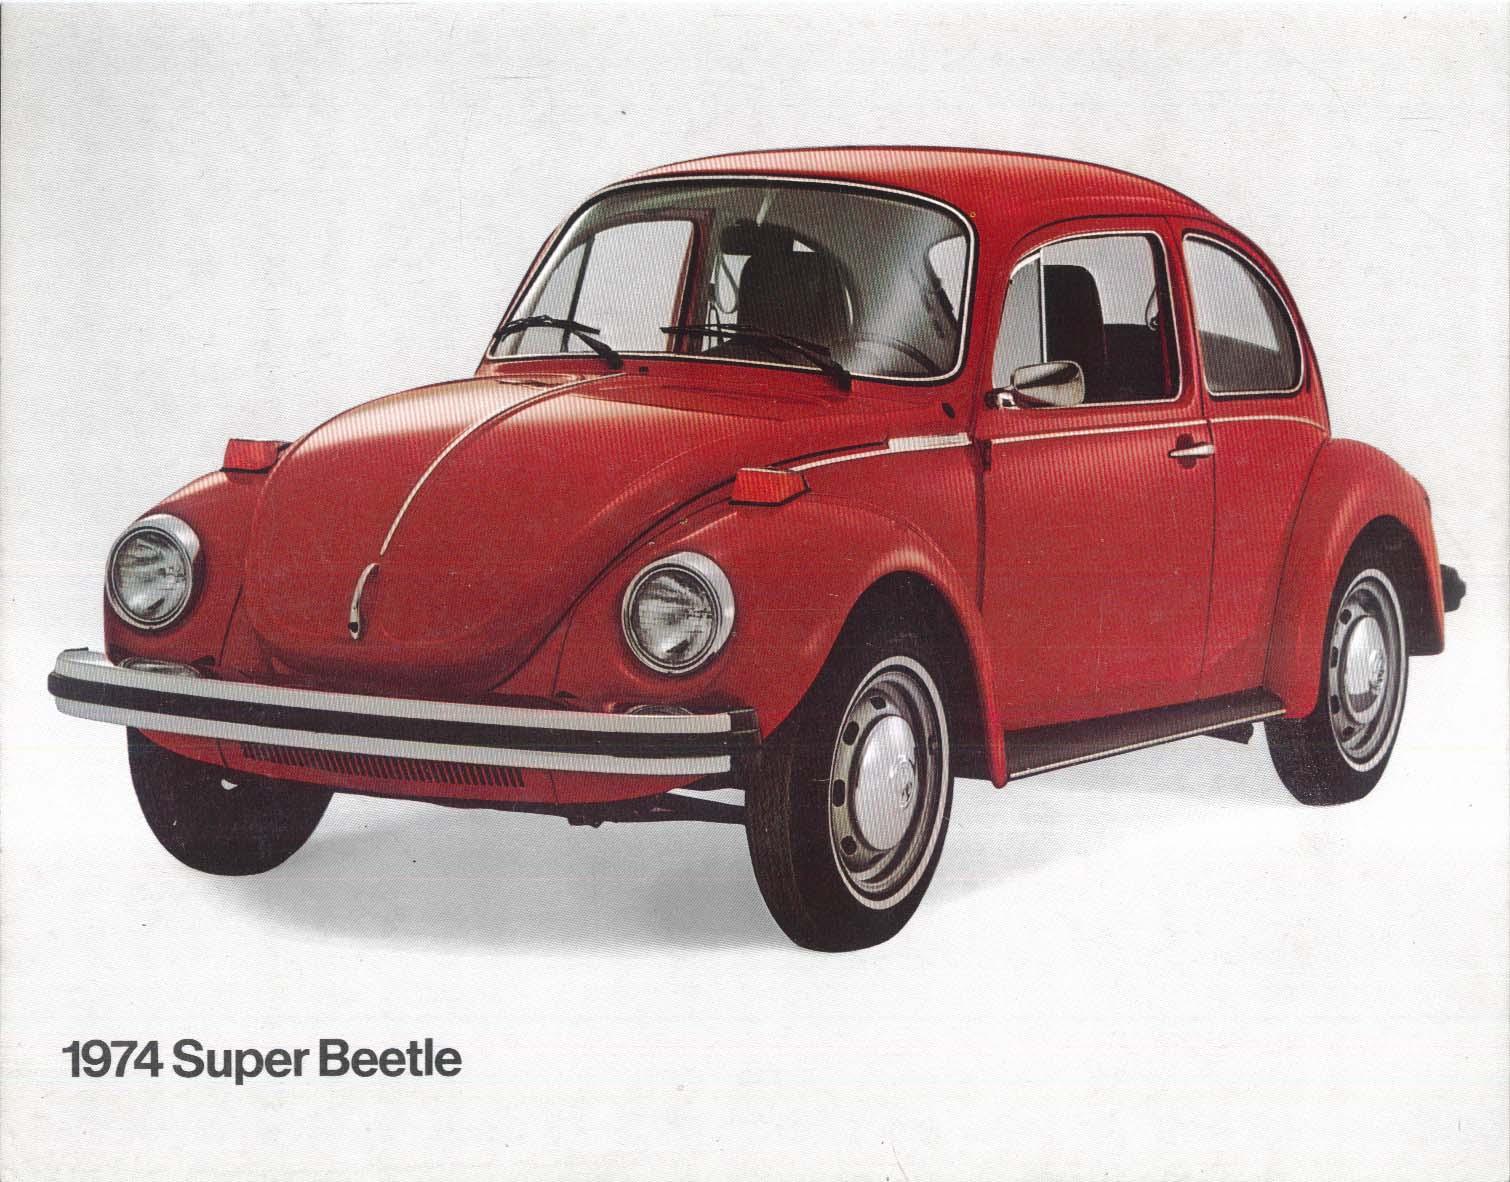 Image for 1974 Volkswagen Super Beetle sell sheet 33-11-46030